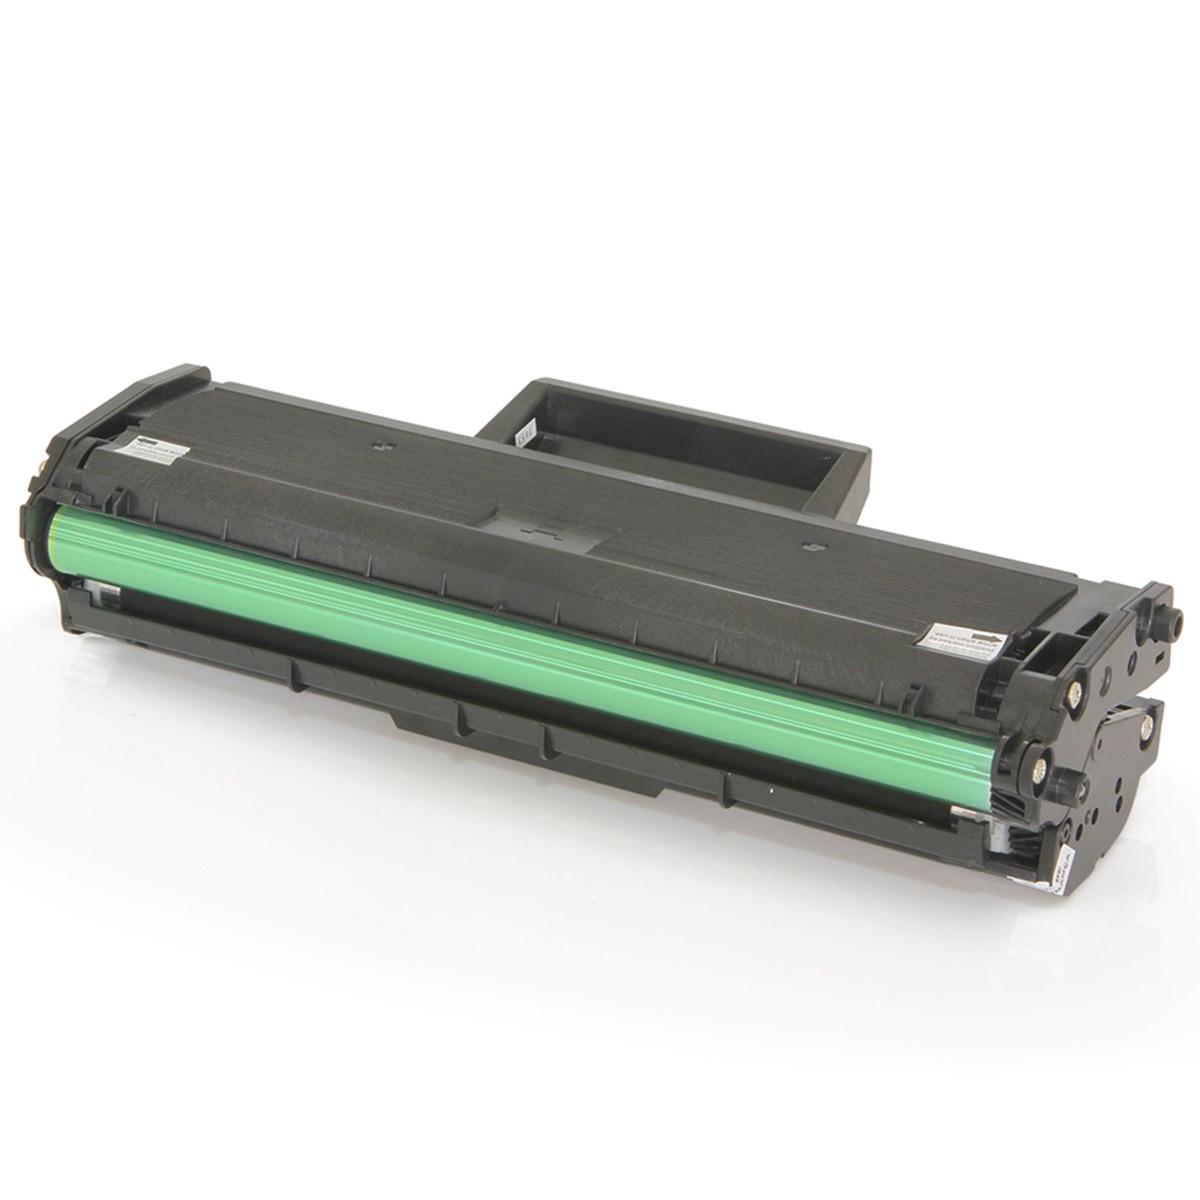 Toner Compatível com Samsung MLT-D101S 101S | ML2160 2161 2165 SCX3400 SCX3401 Premium Quality 1.5k